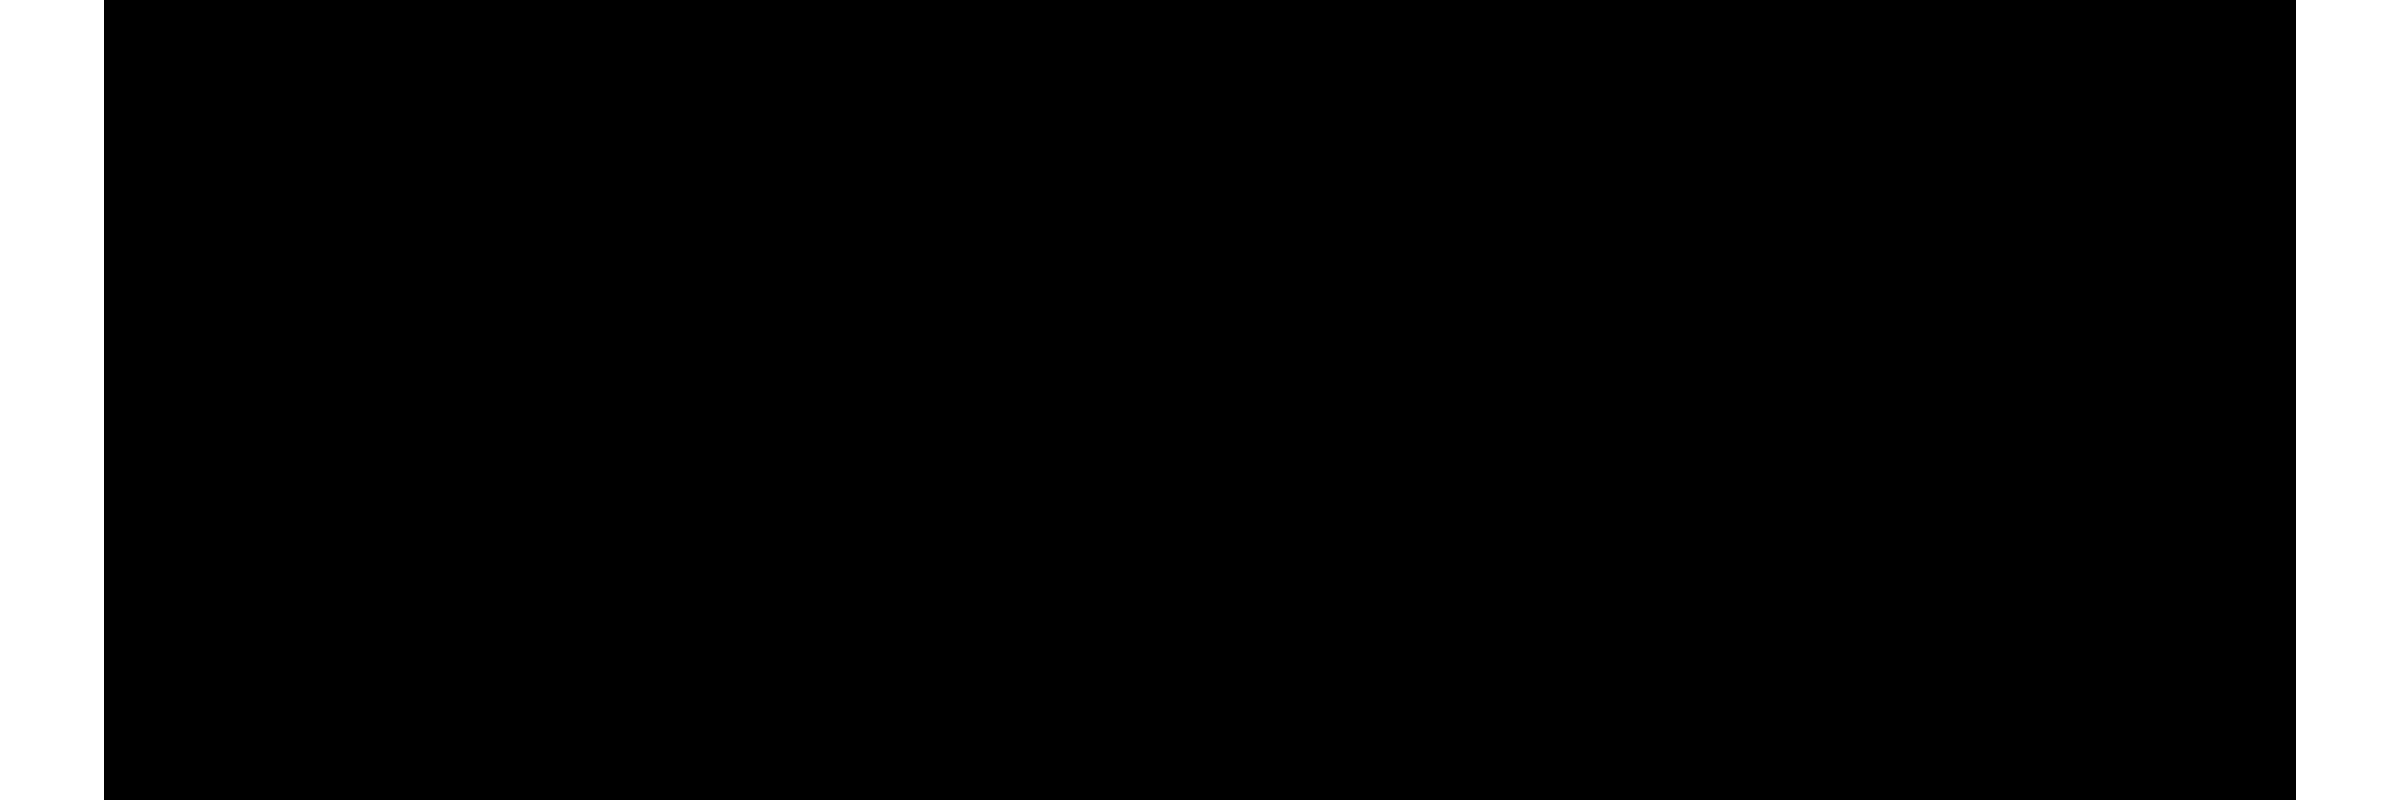 fsb-2-logo-png-transparent